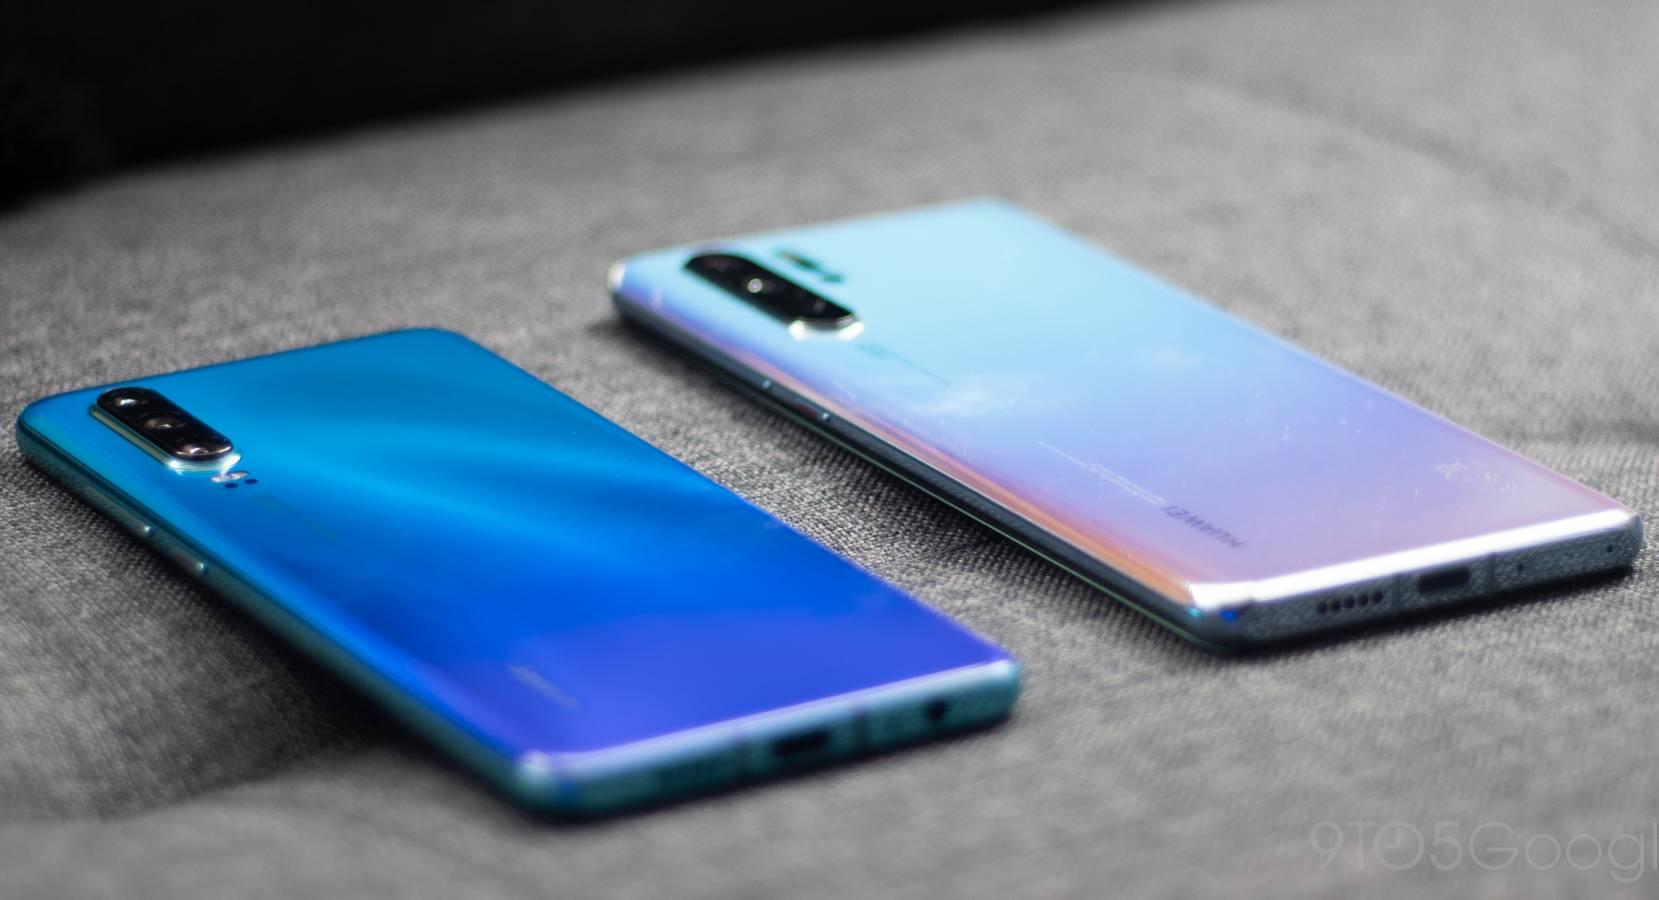 Clientii cu Telefoane Huawei, Vestea GROZAVA dupa LOVITURILE DURE